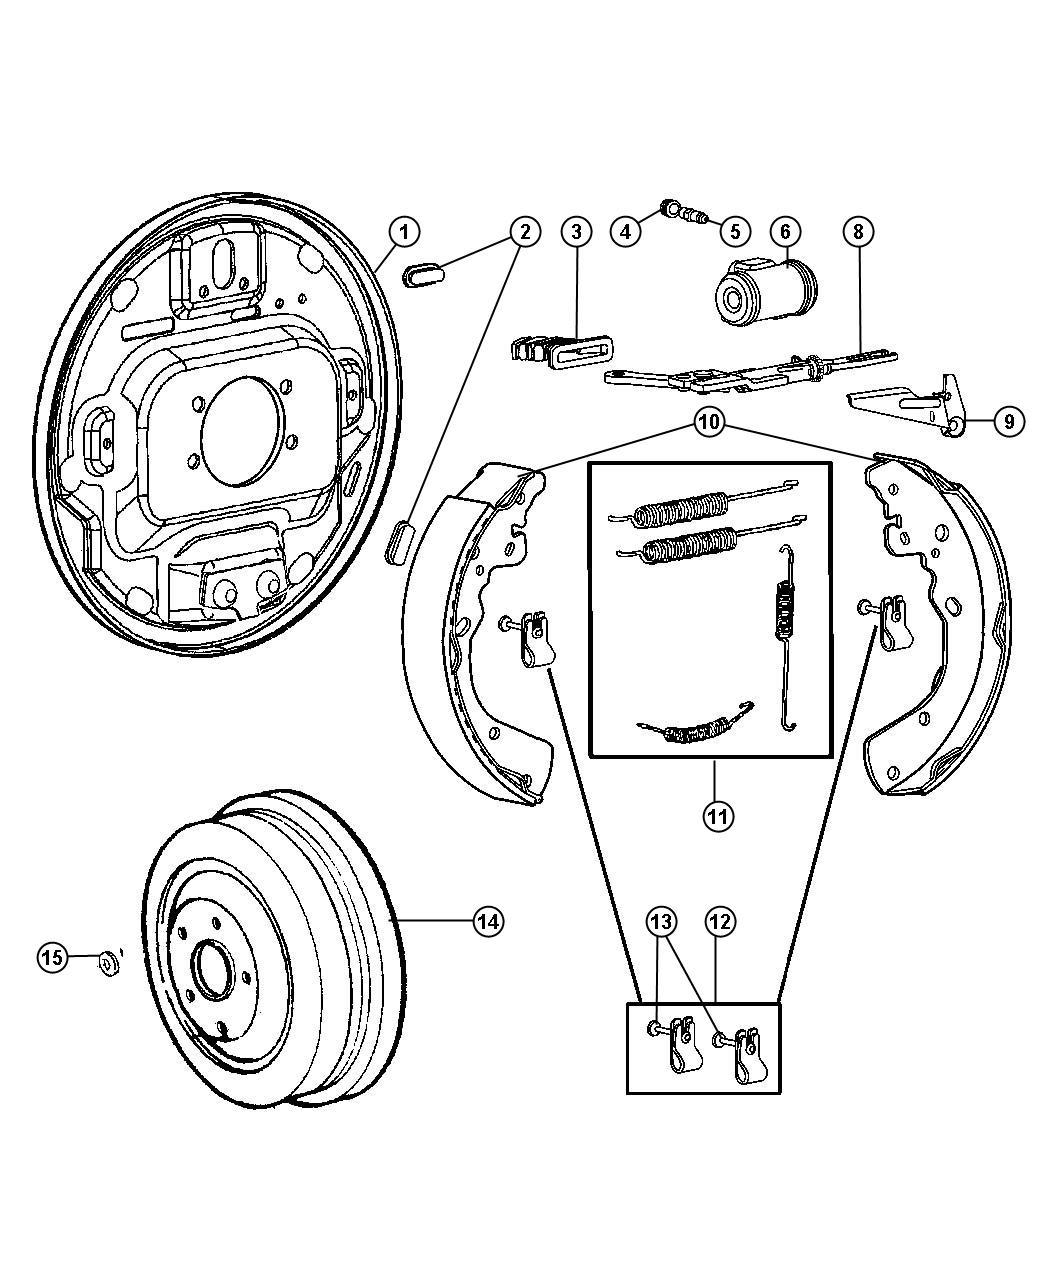 Ram Dakota Big Horn Used For Shoe And Lining Kit